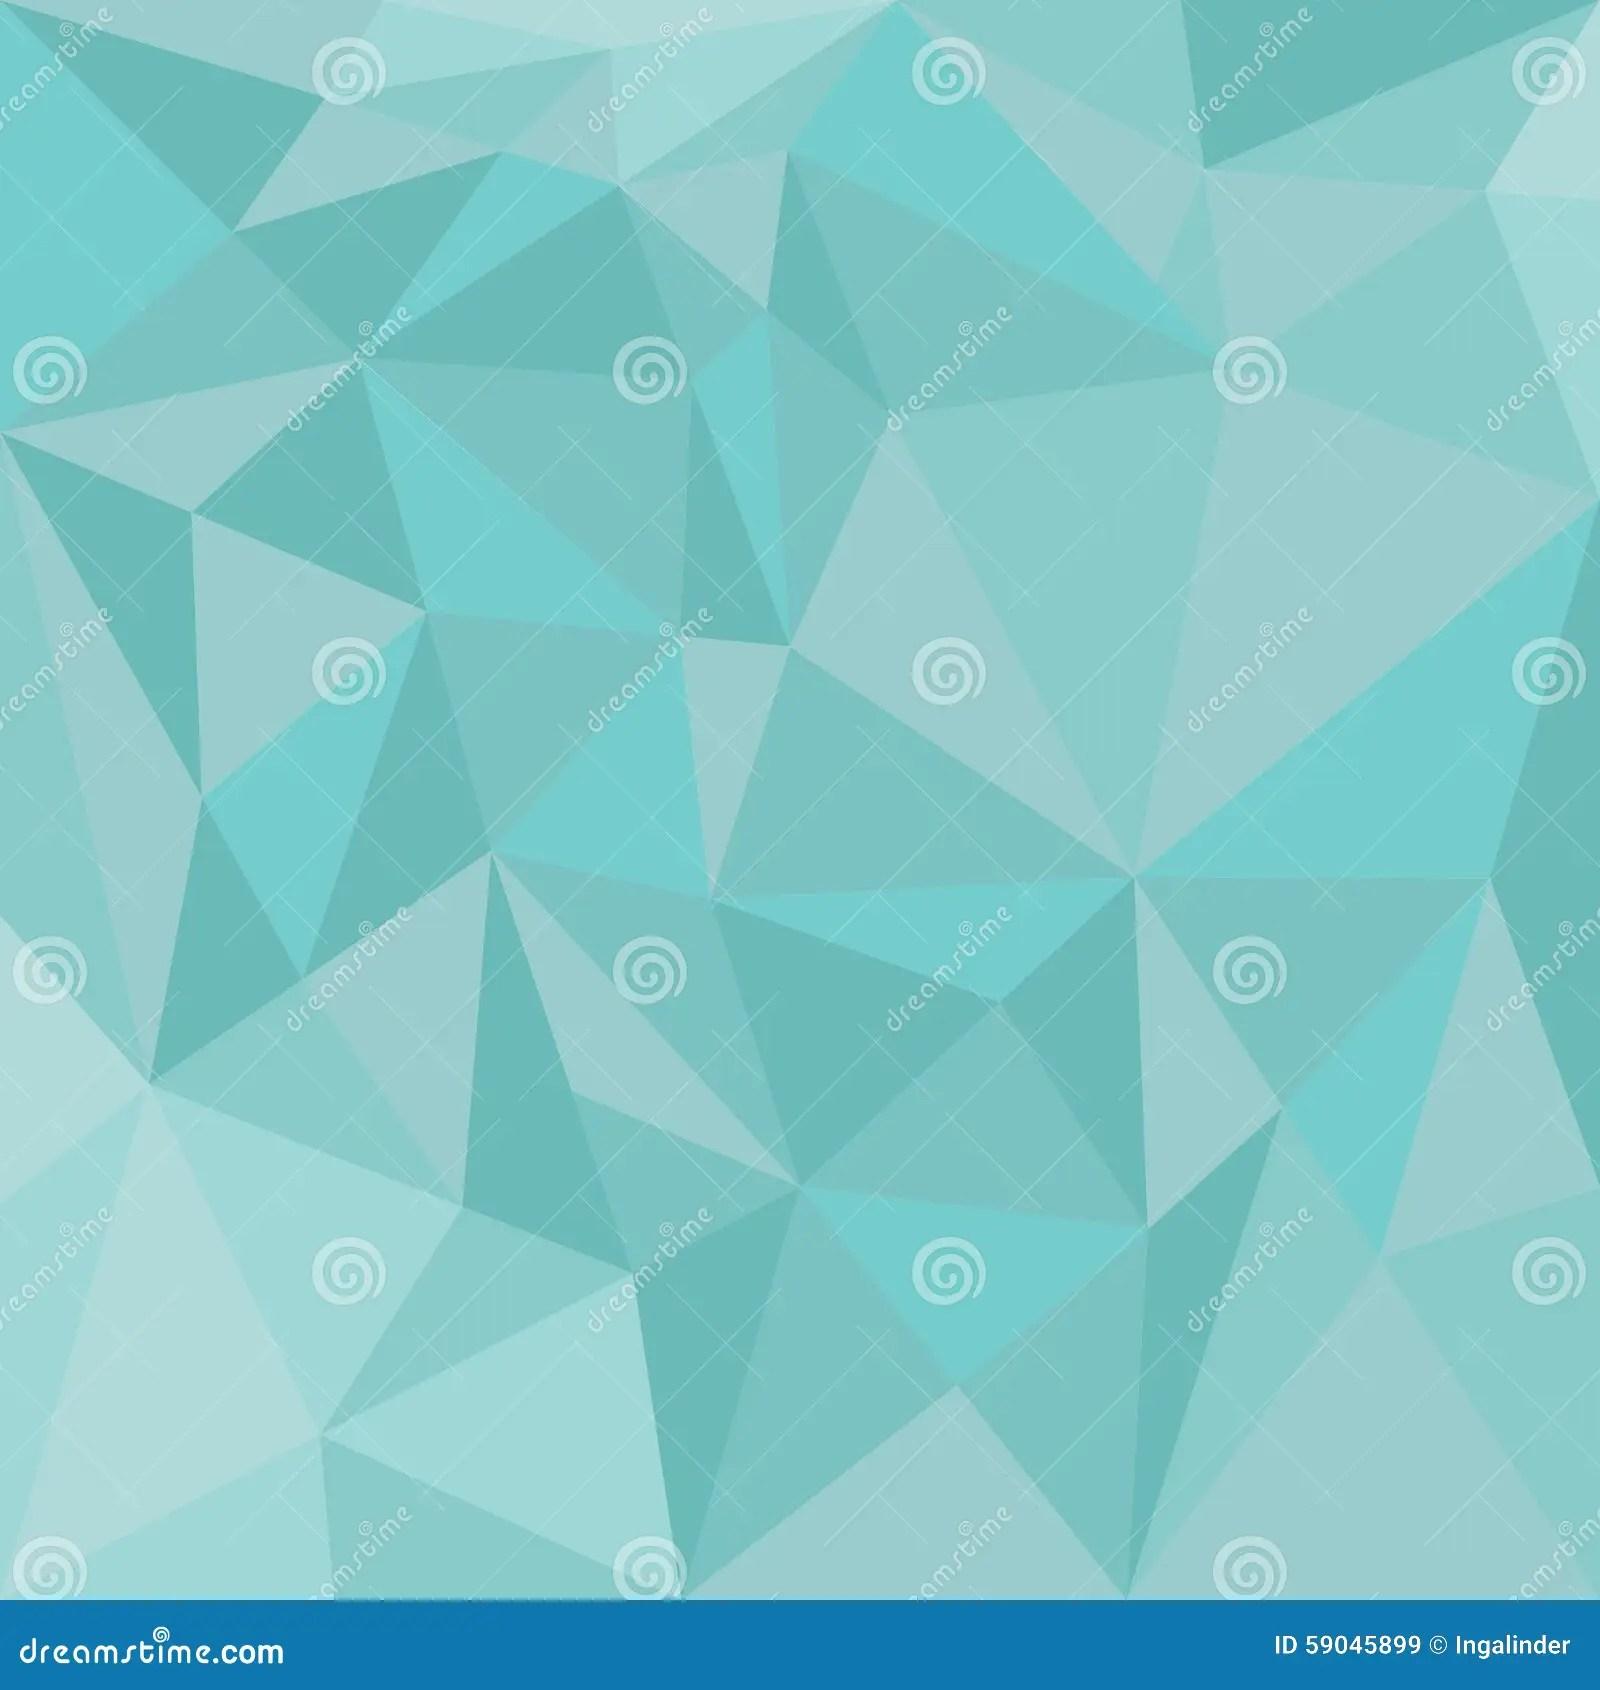 blue chevron pattern template